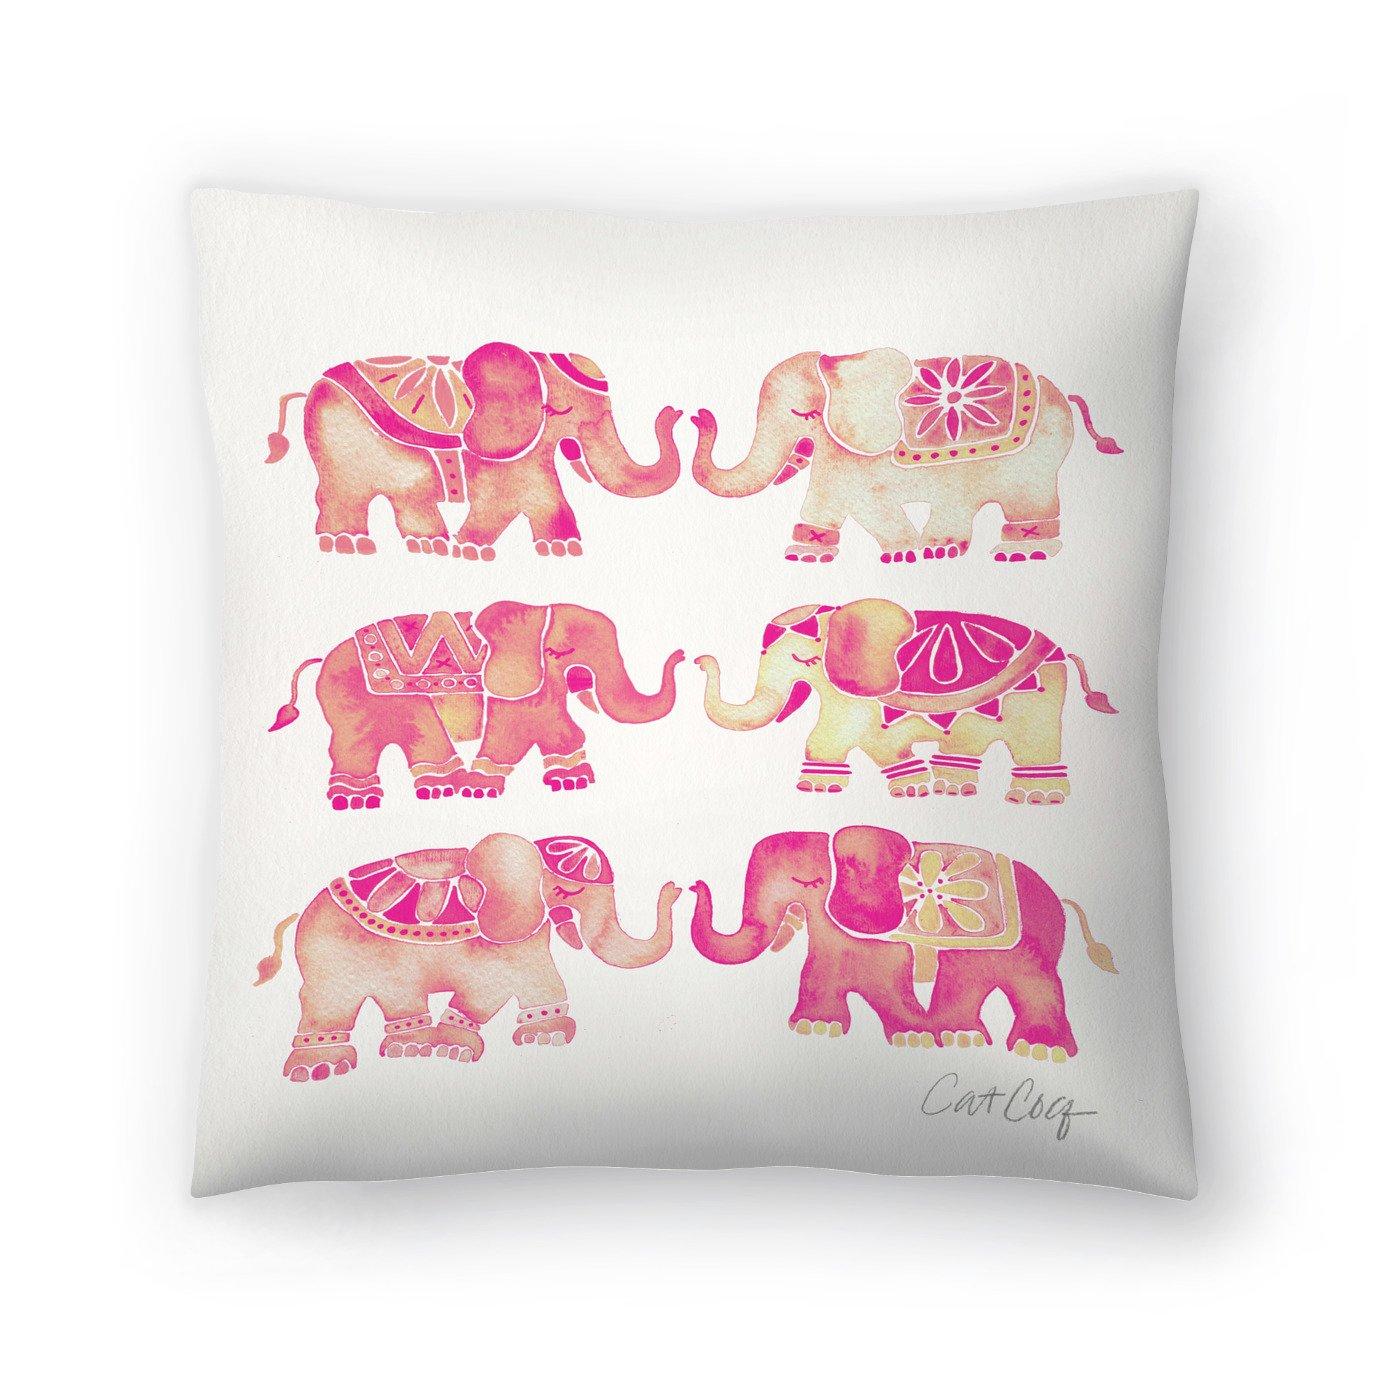 Amazon.com: Americanflat - Cojín rosa con diseño de elefante ...